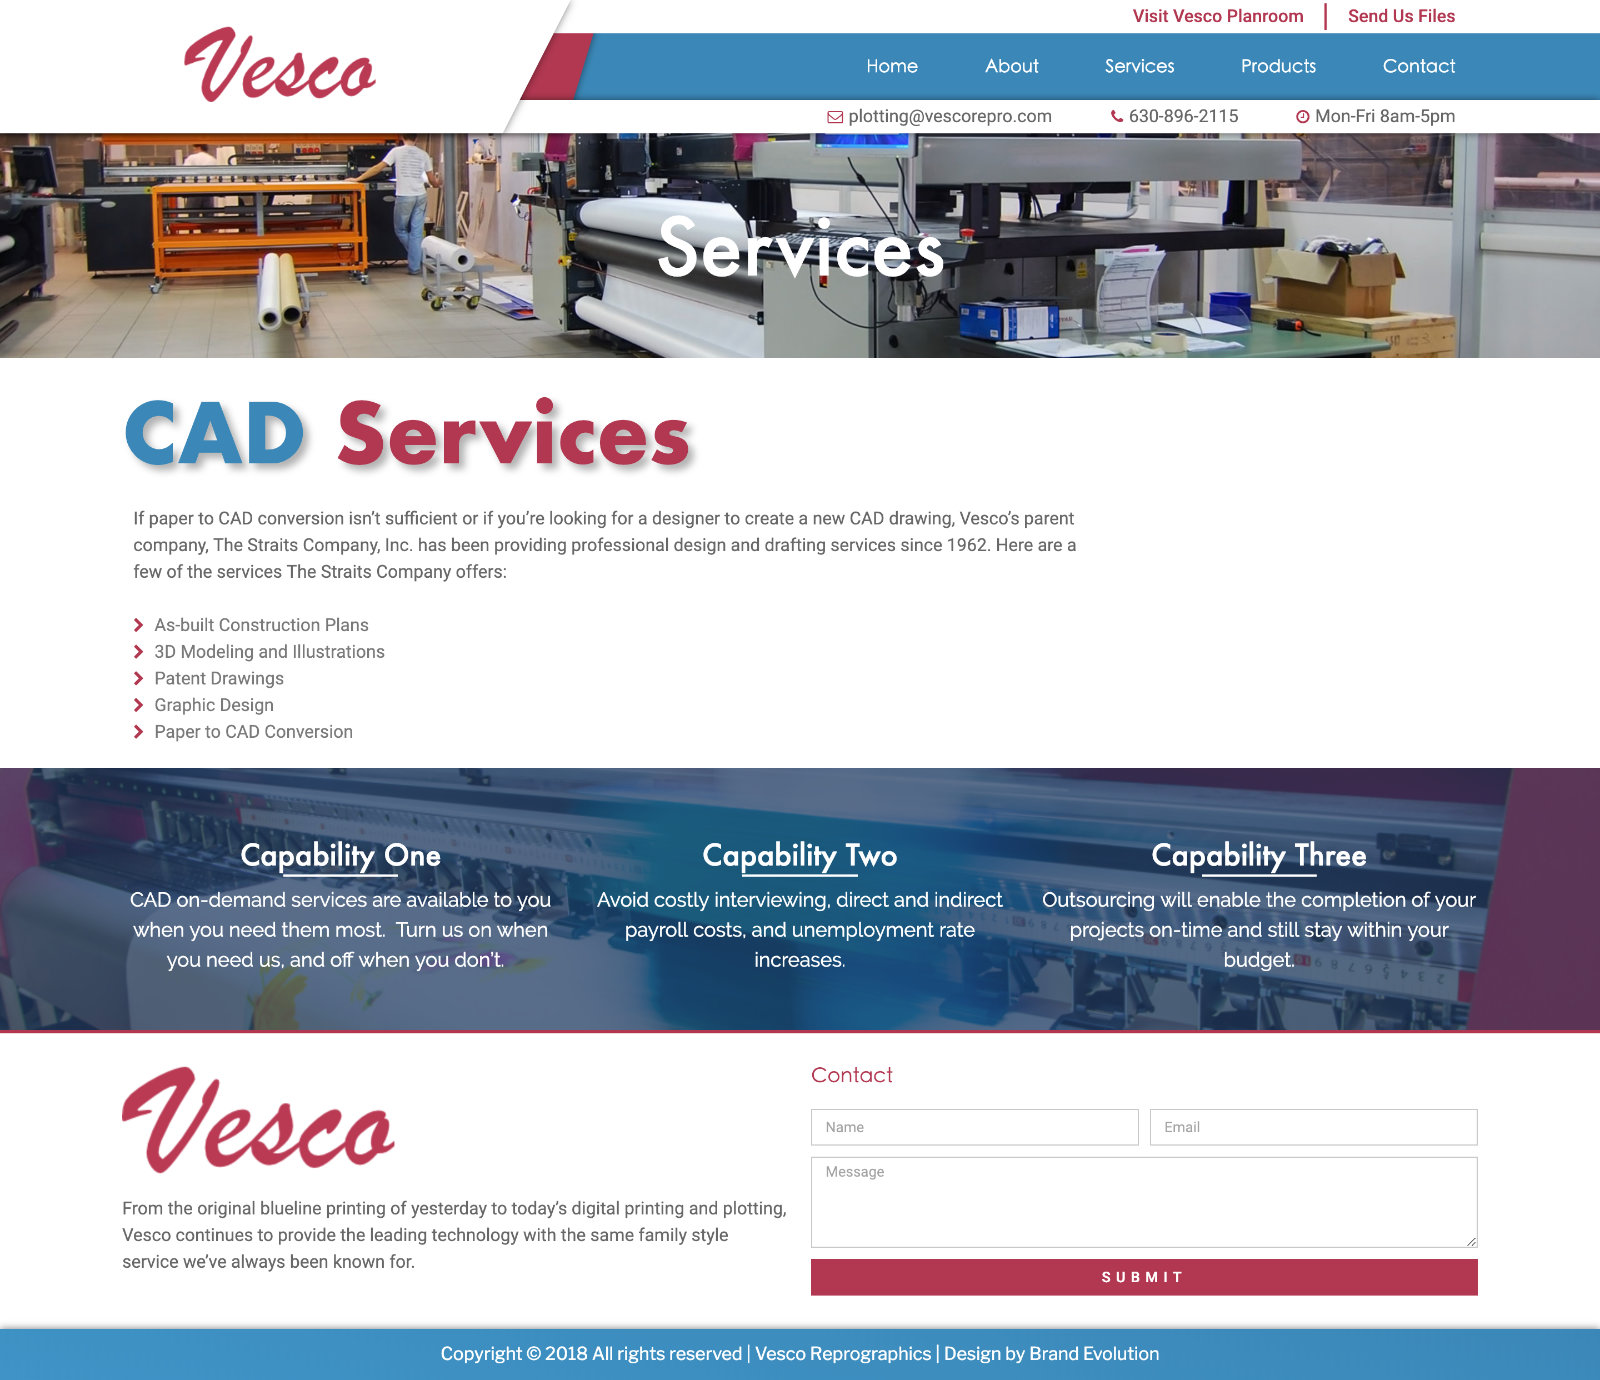 Vesco Services